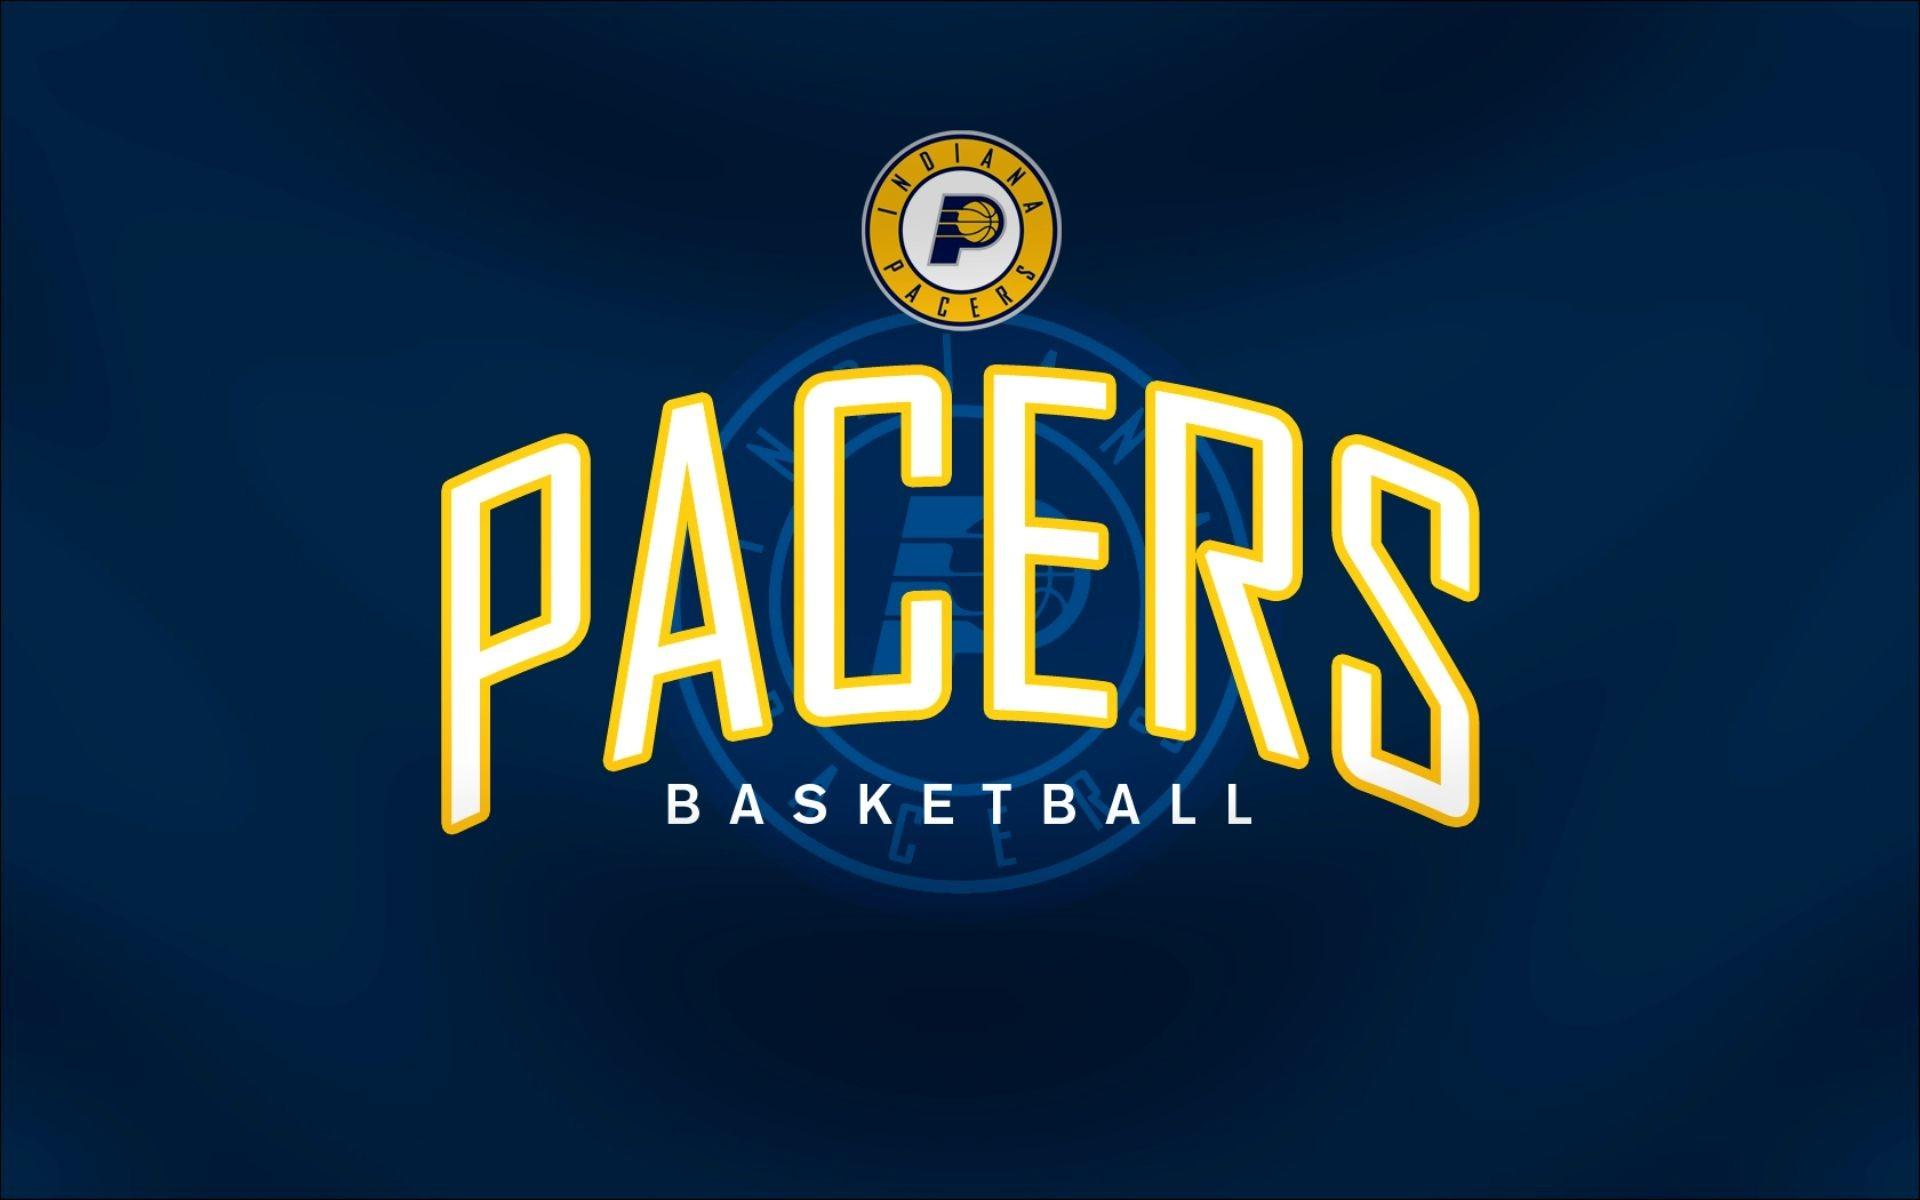 1920x1200 NBA Logo Backgrounds (49 Wallpapers)